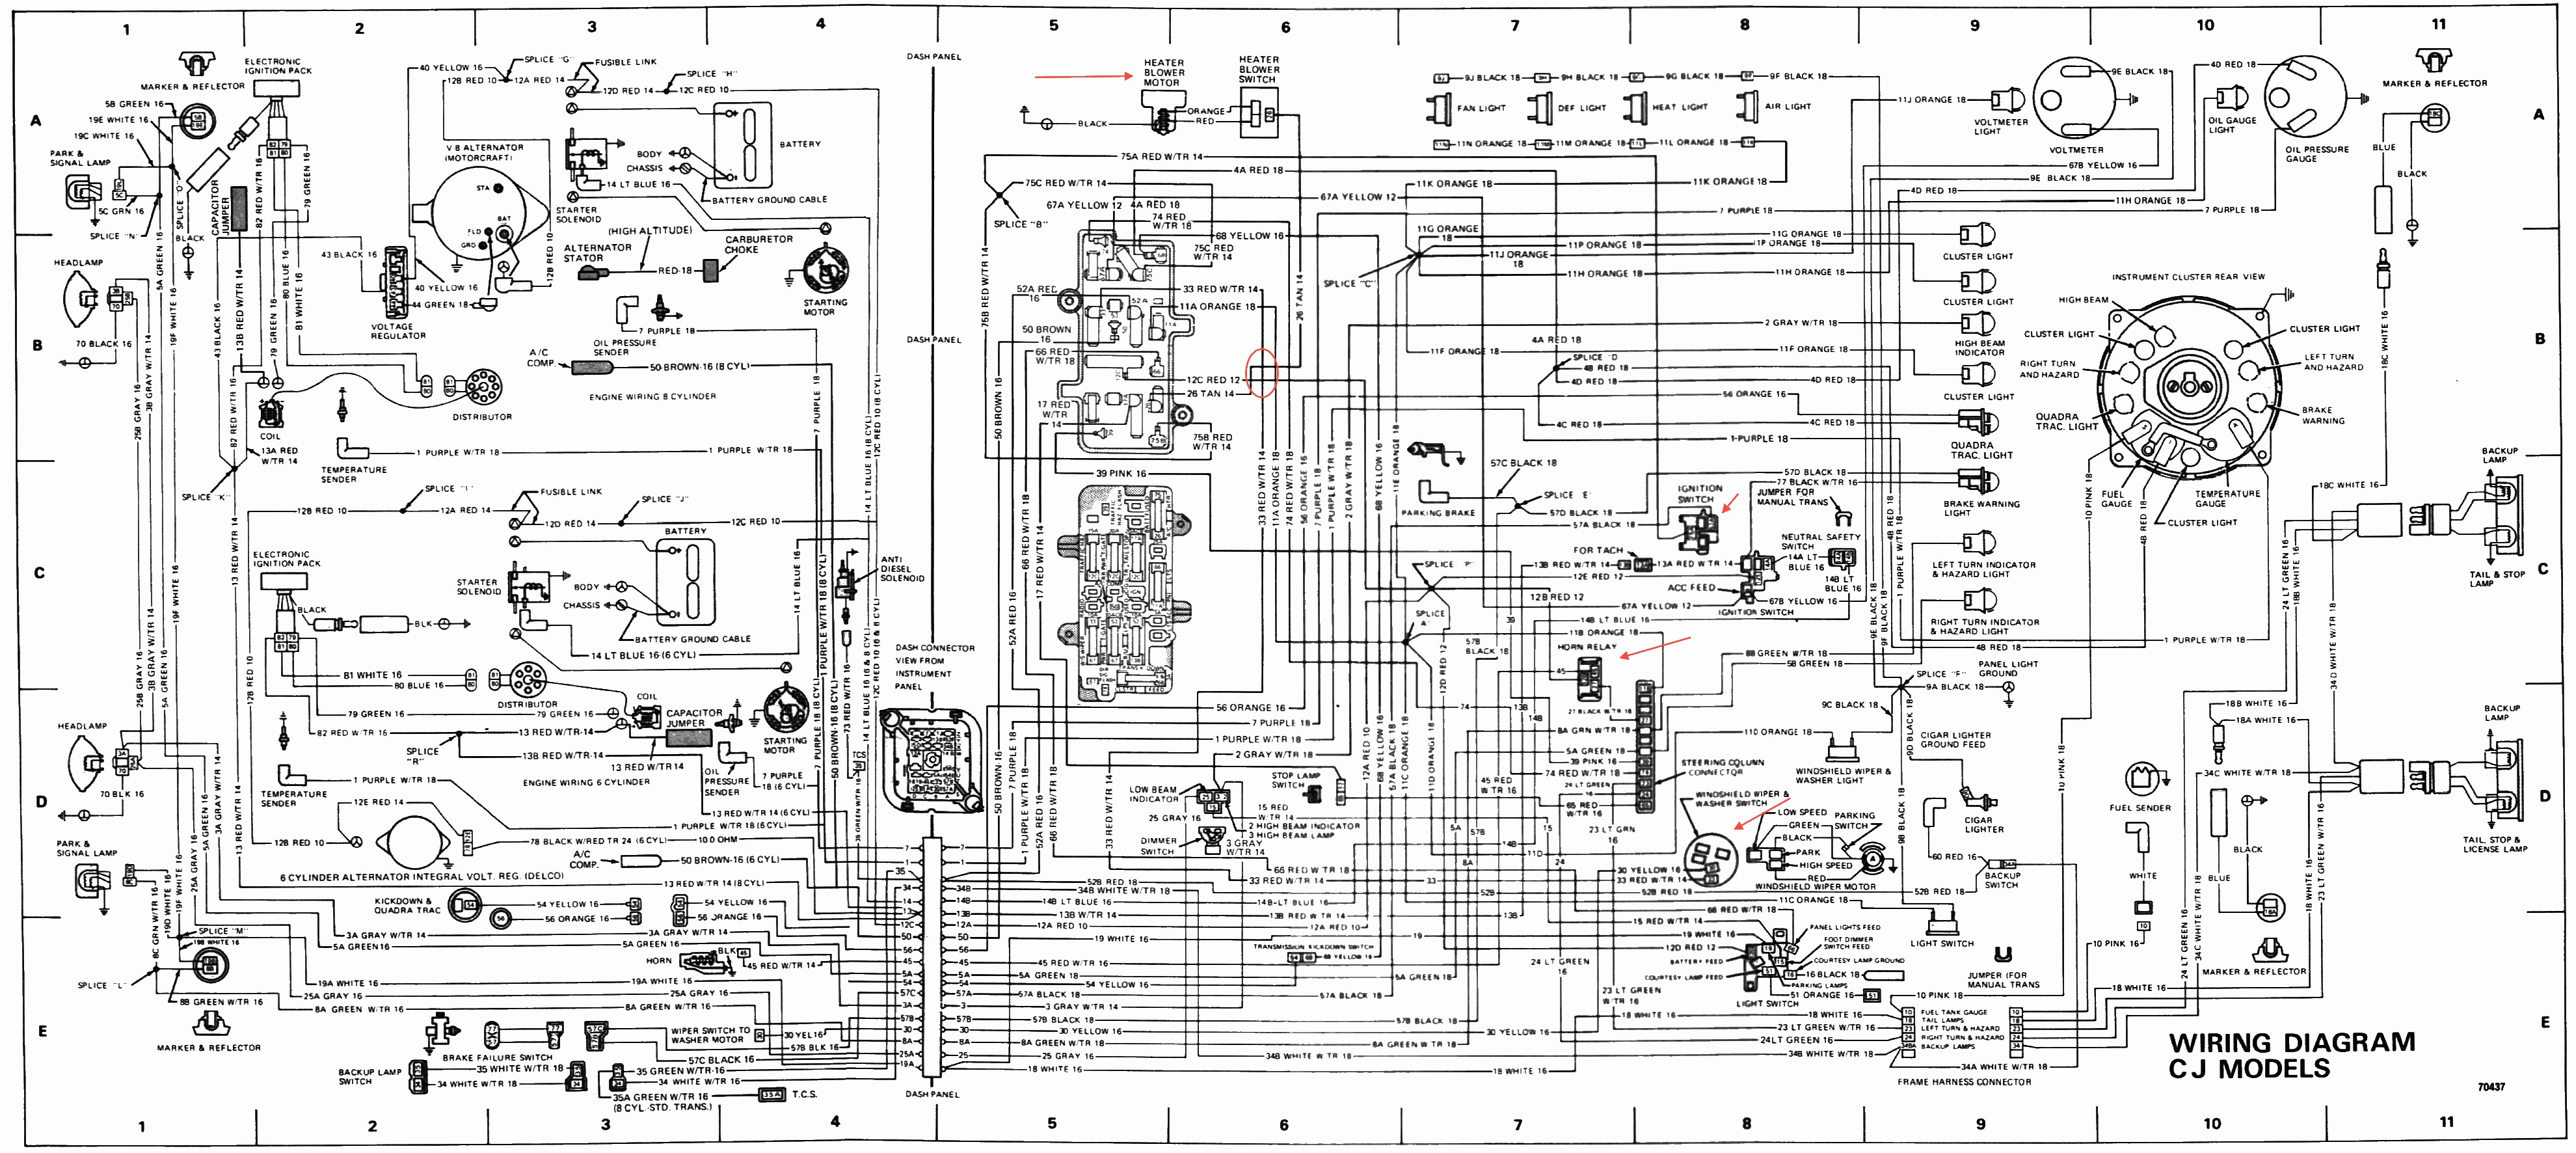 77 cj7 wiring diagram